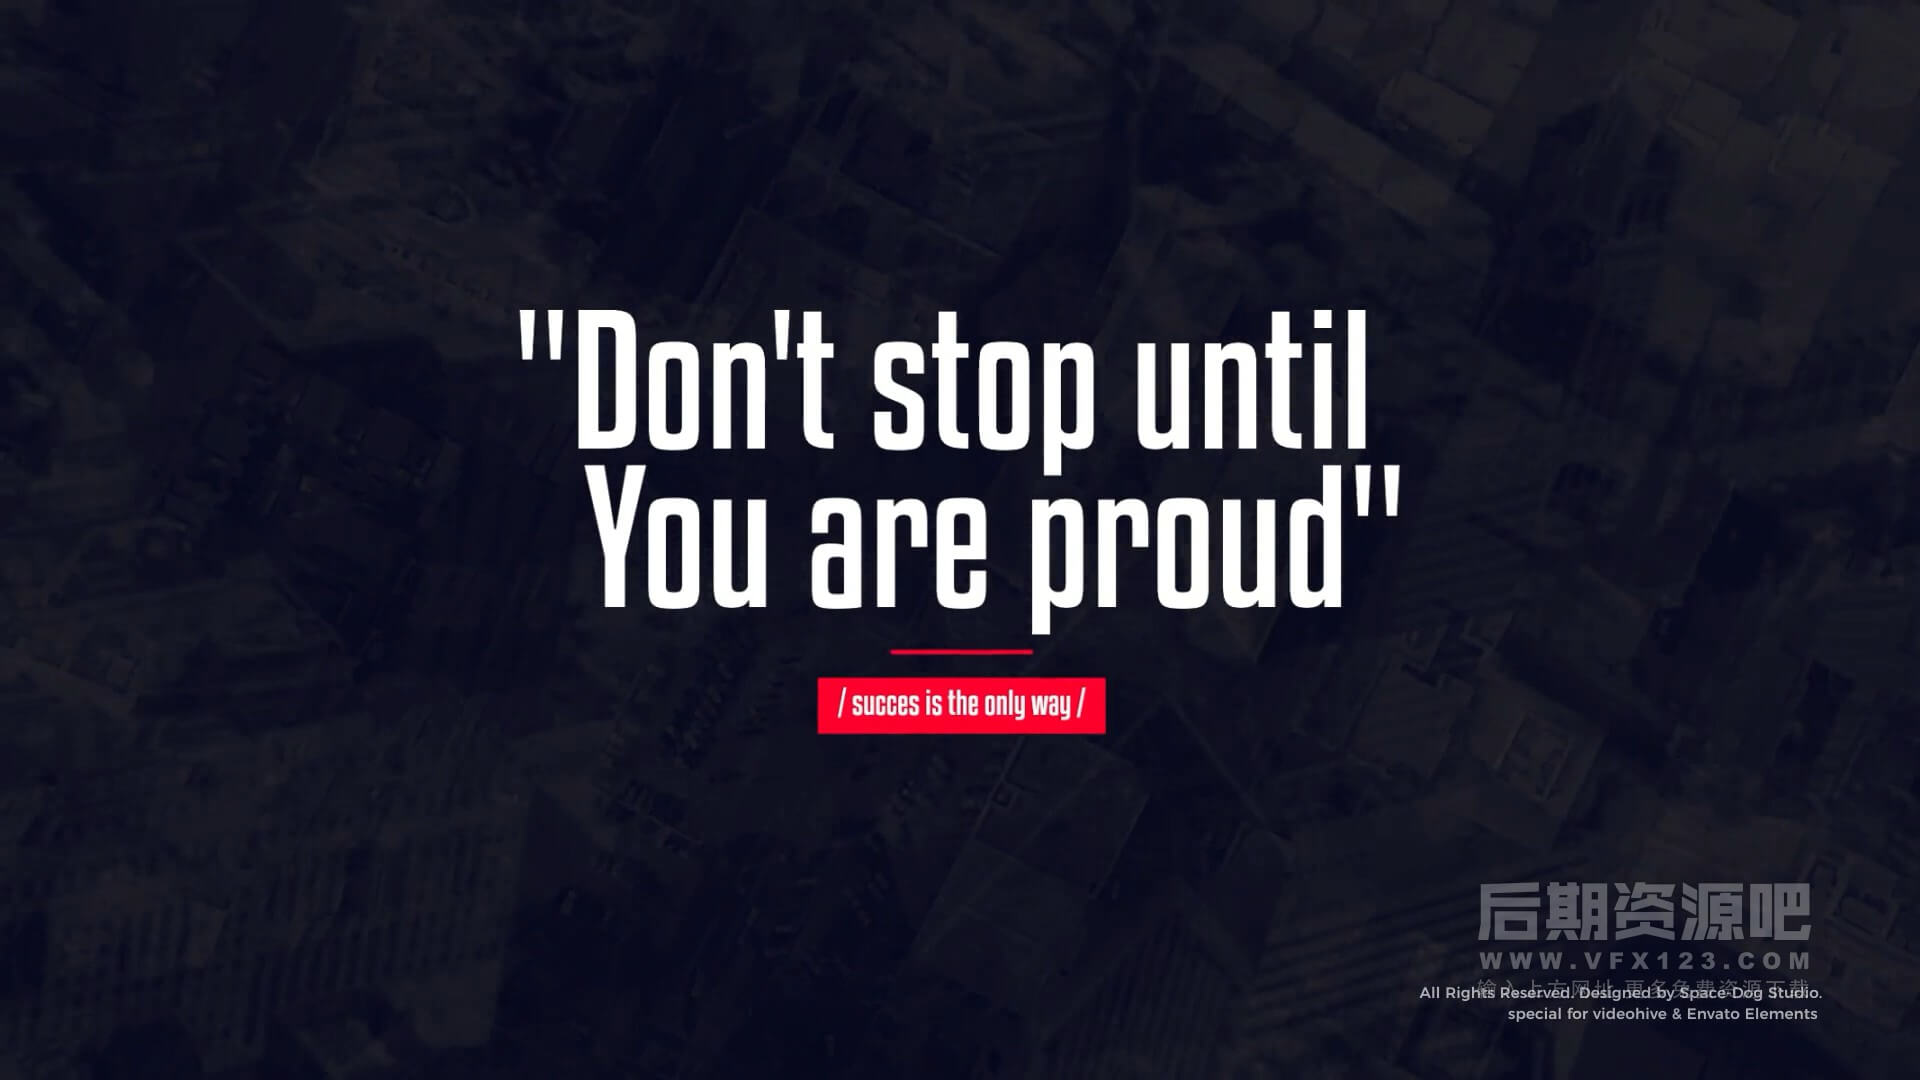 fcpx标题插件 25组商务简约风格文字标题动画模板 Titles Motivational